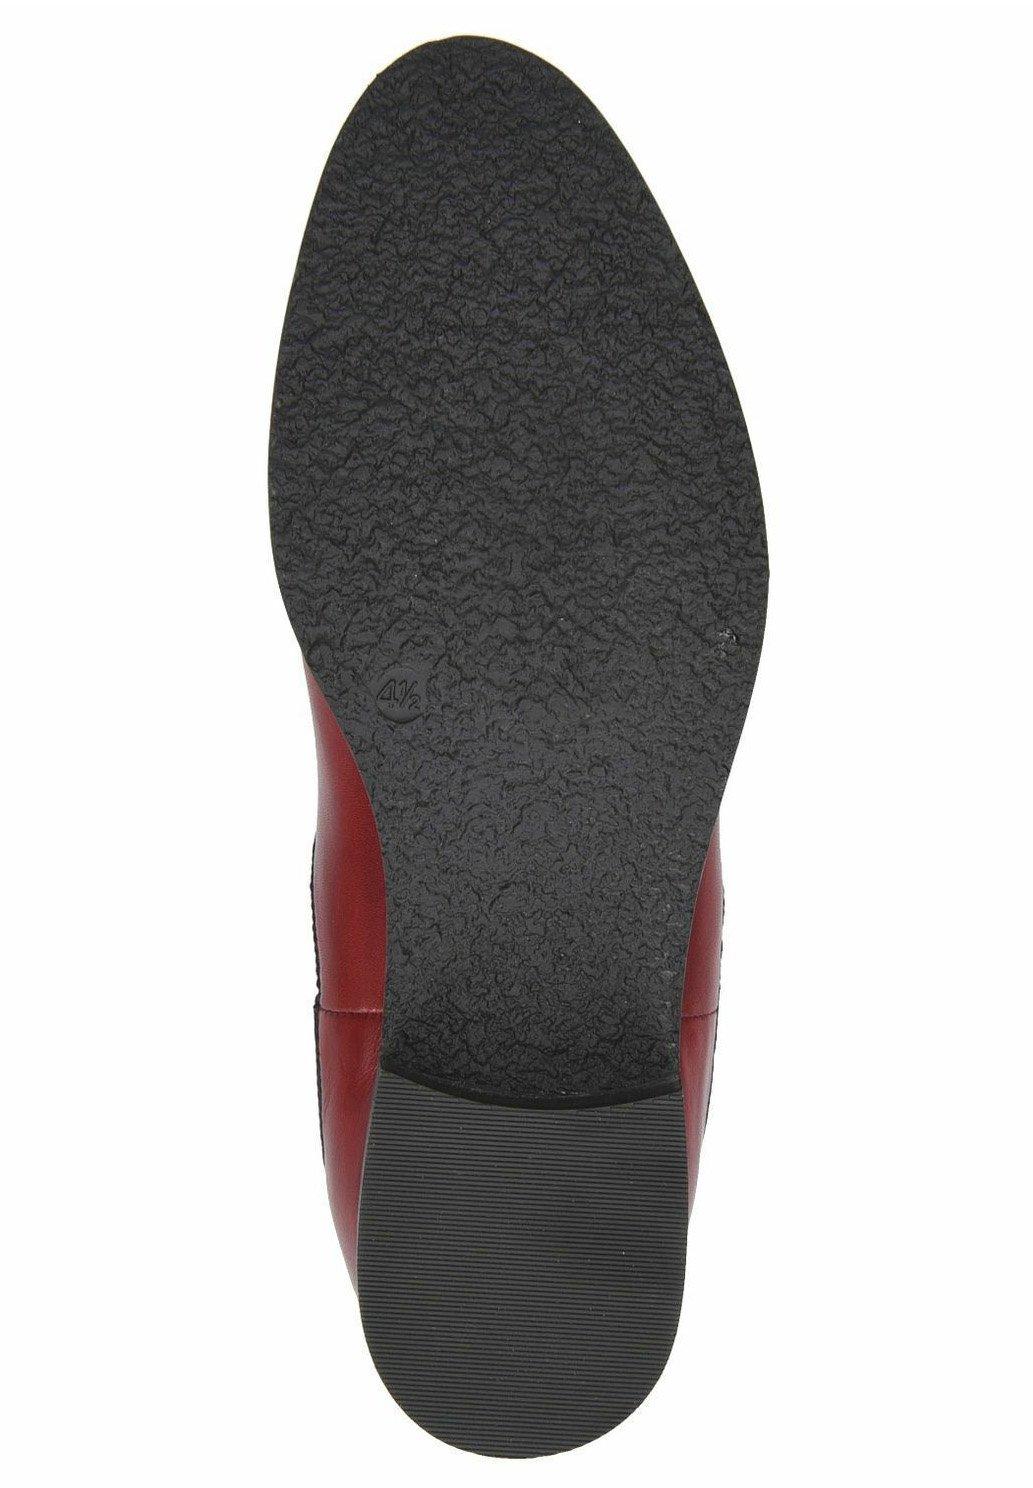 Caprice CHELSEA BOOT - Nilkkurit - rosso nappa - Naisten kengät LDYw1